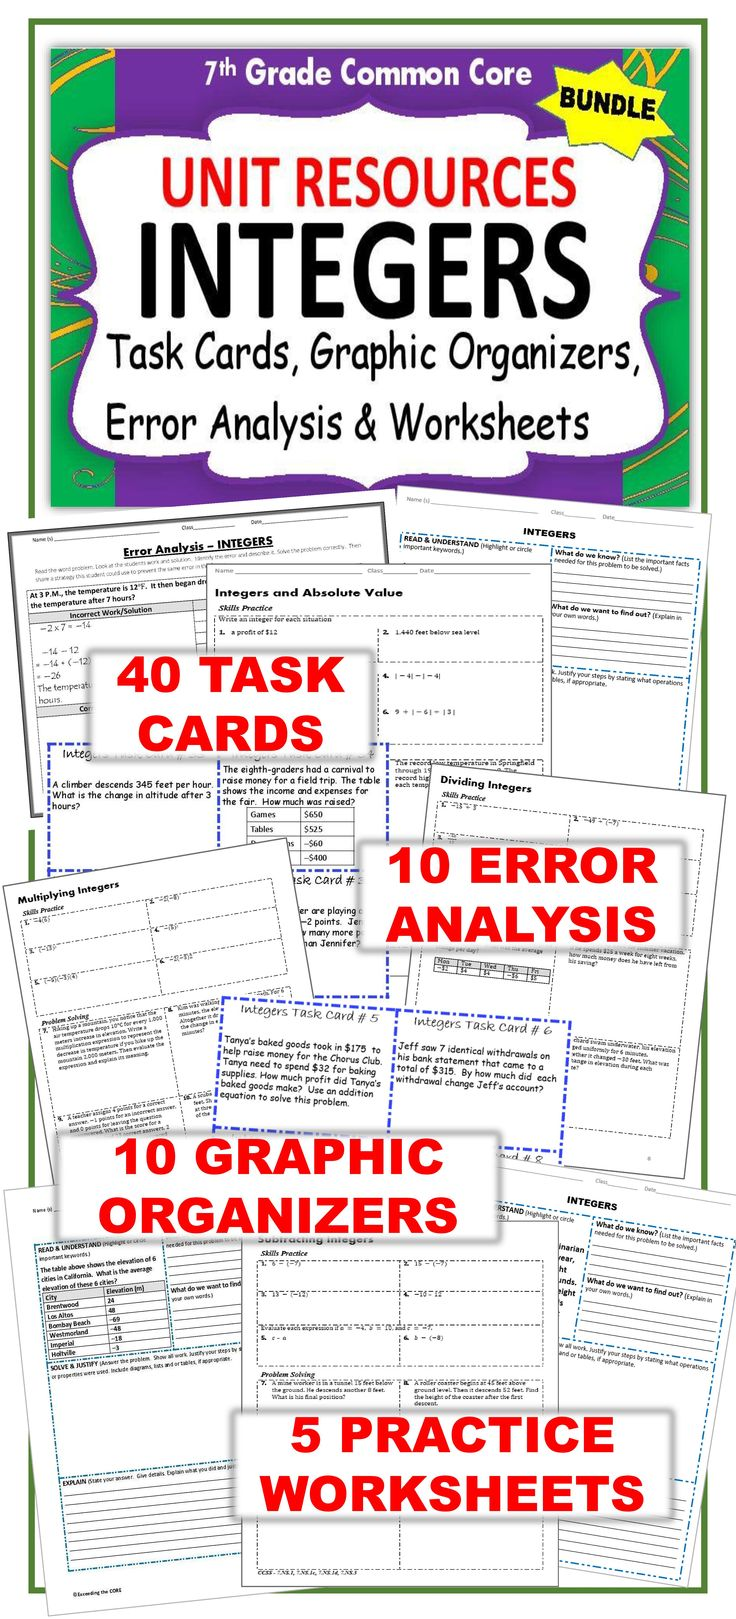 medium resolution of Exceeding the CORE: 7th Grade INTEGERS BUNDLE - Task Cards